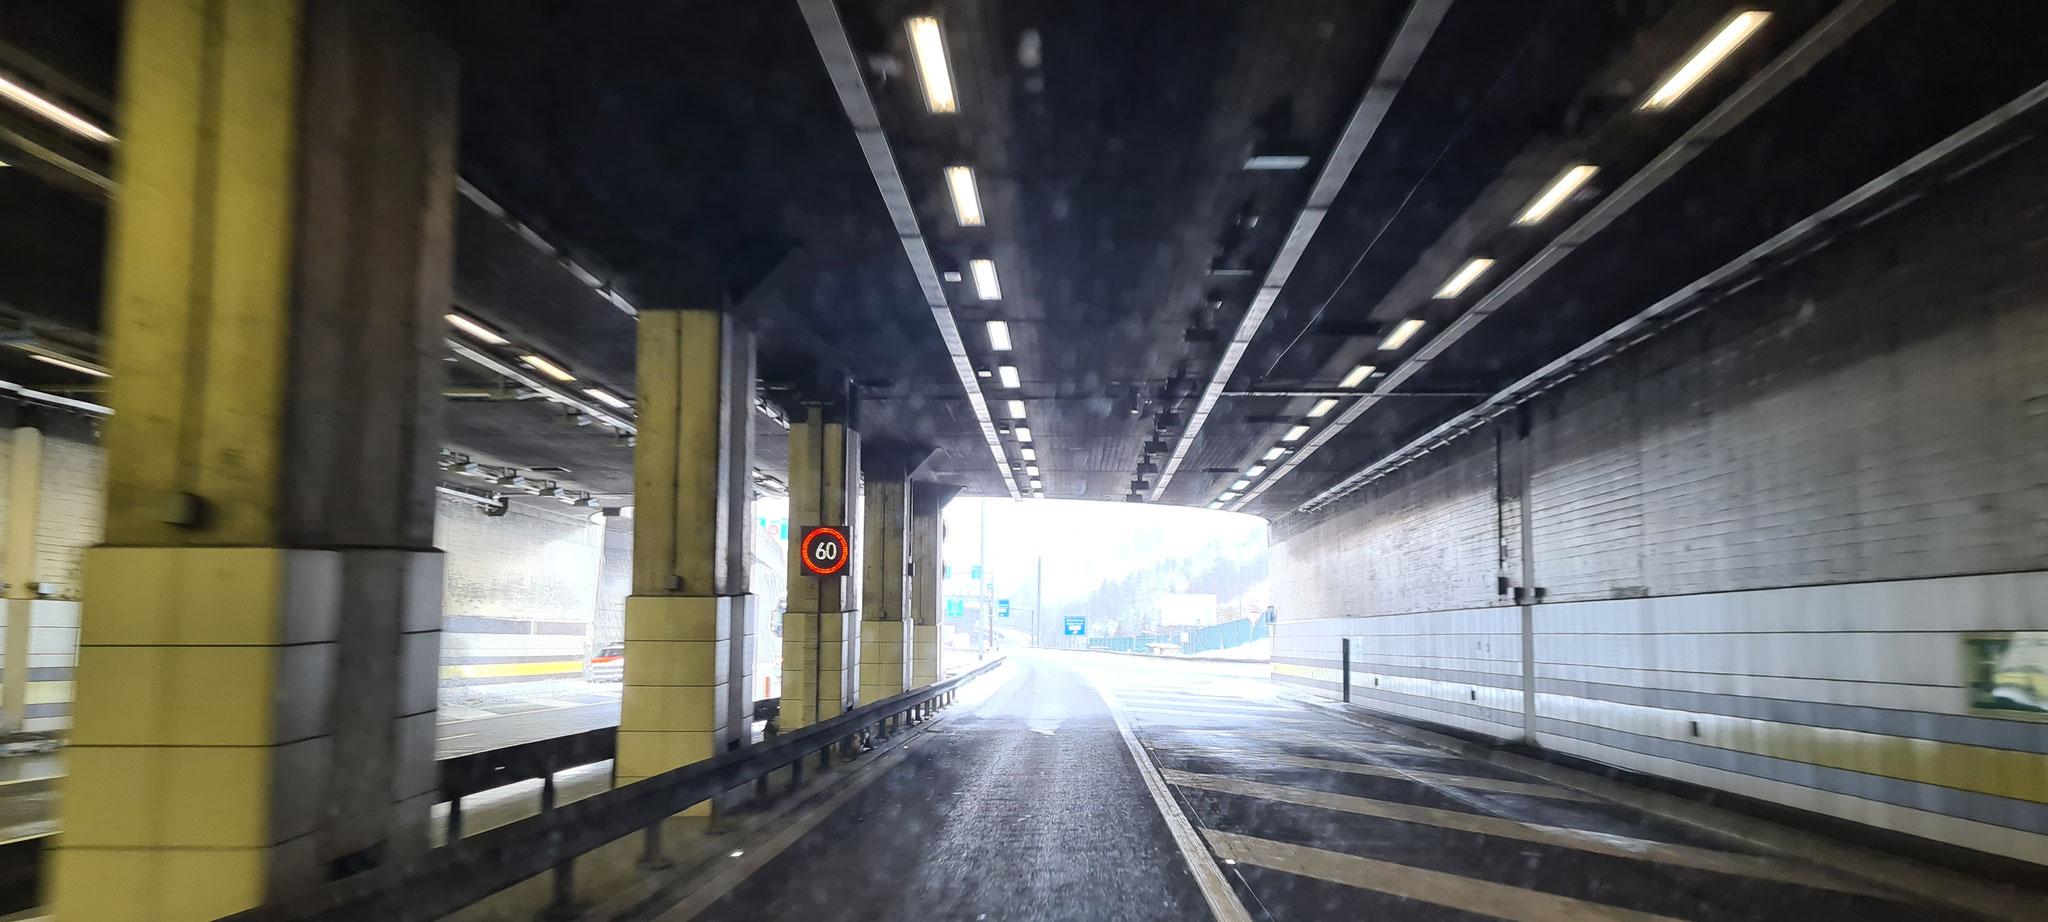 Raus aus dem Gotthard-Tunnel...